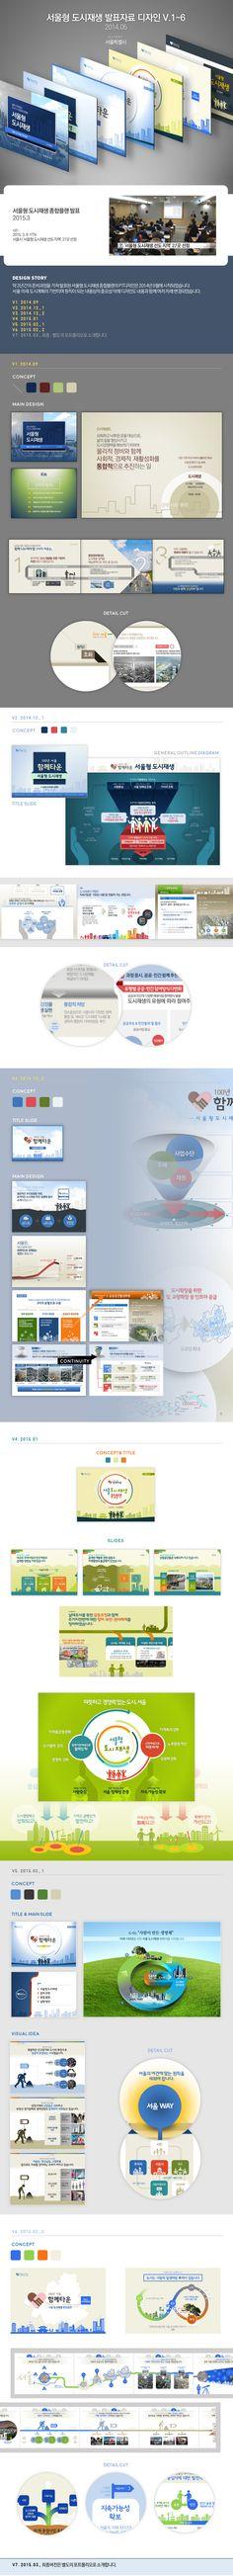 Seoul Urban Regeneration Plan 2015, Presentation Design with infographic. design by ptwiz. / 서울형 도시재생 발표자료 디자인 BY 피티위즈 / 클라이언트 : 서울특별시 도시재생본부